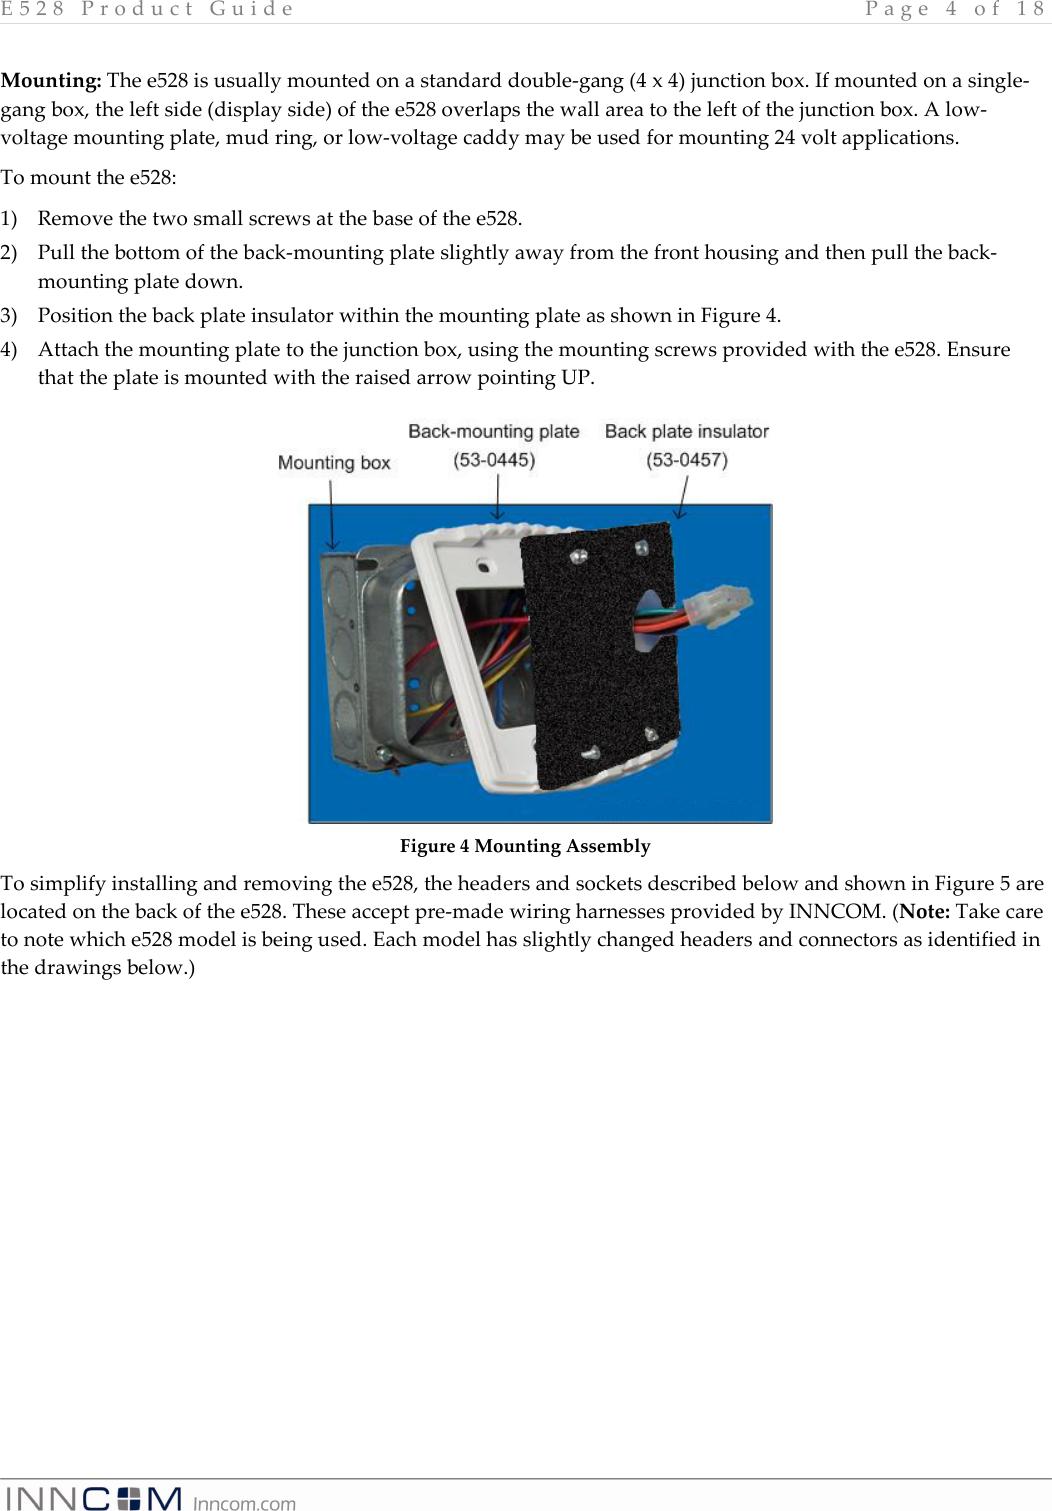 Electrical Wiring 4 Gang Box Manual Guide